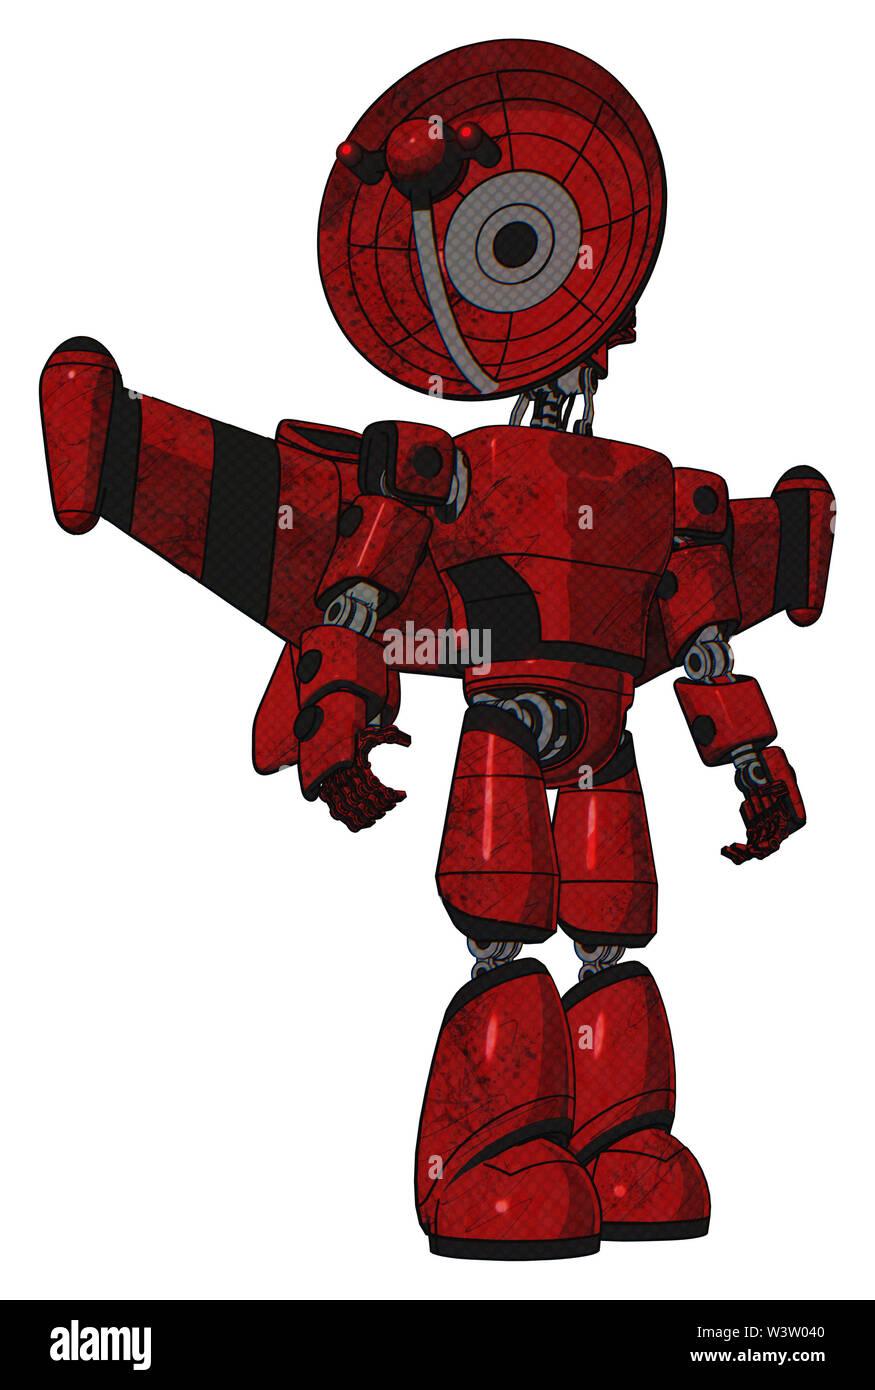 Cyborg containing elements: dual retro camera head, satellite dish head, light chest exoshielding, prototype exoplate chest, stellar jet wing rocket p - Stock Image